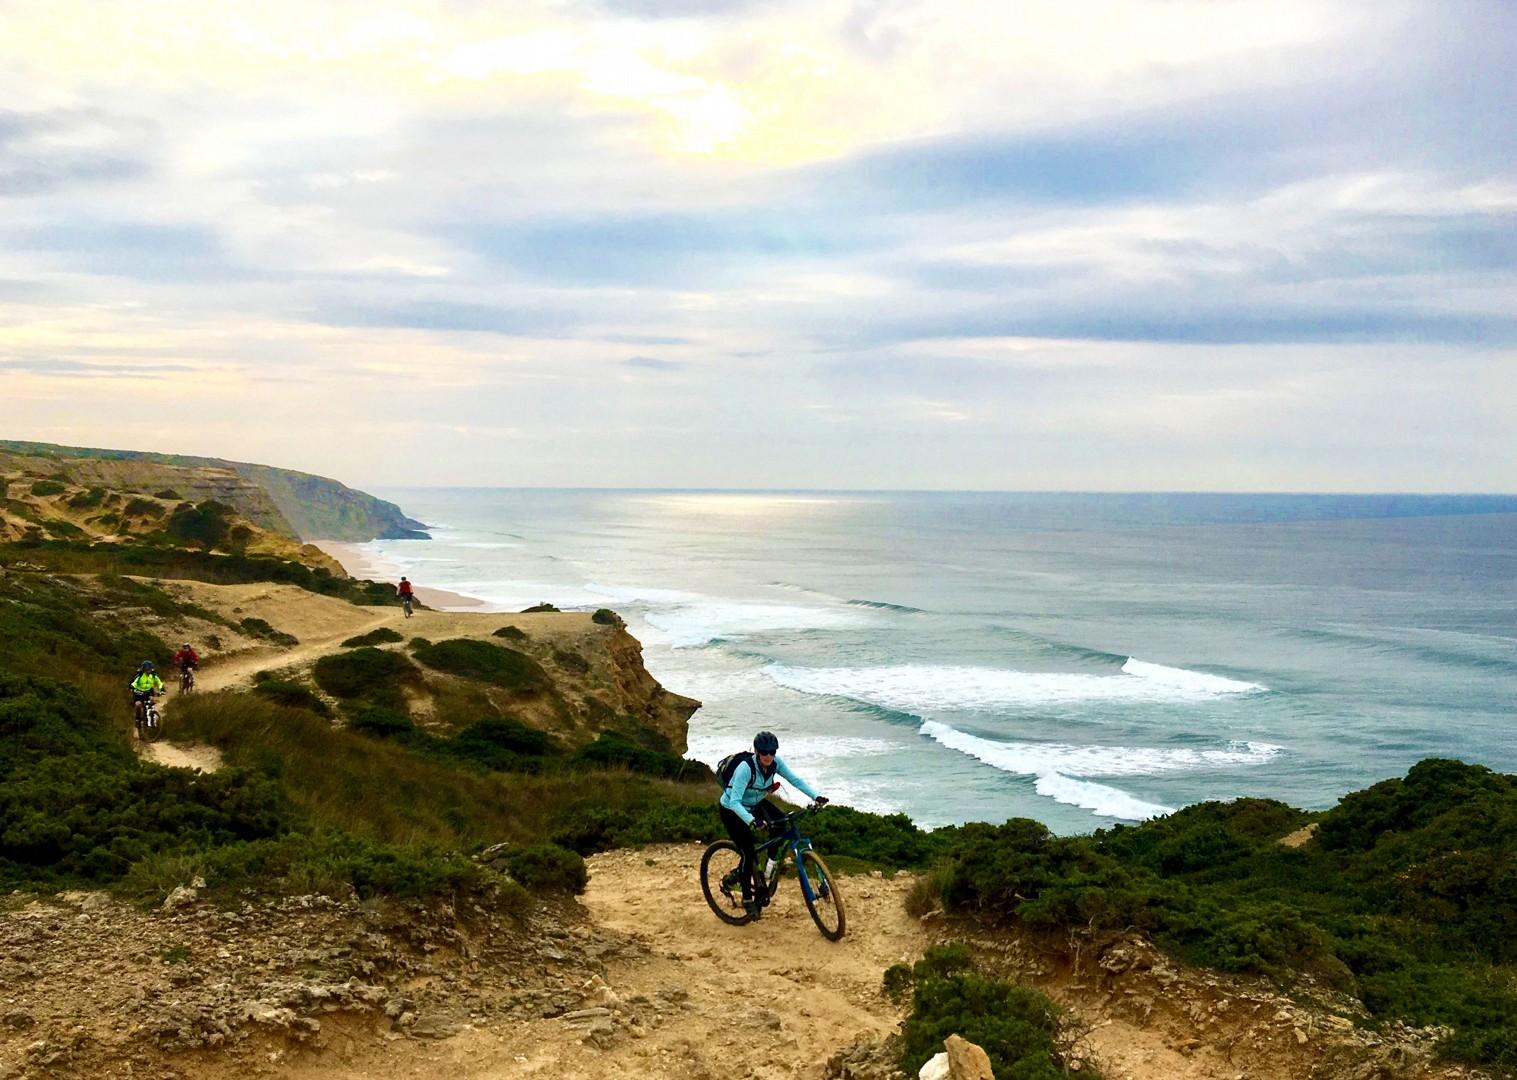 coastal-track-mtb-cycling-holiday-arrabida-natural-park.jpg - Portugal - Atlantic Trails - Guided Mountain Bike Holiday - Mountain Biking